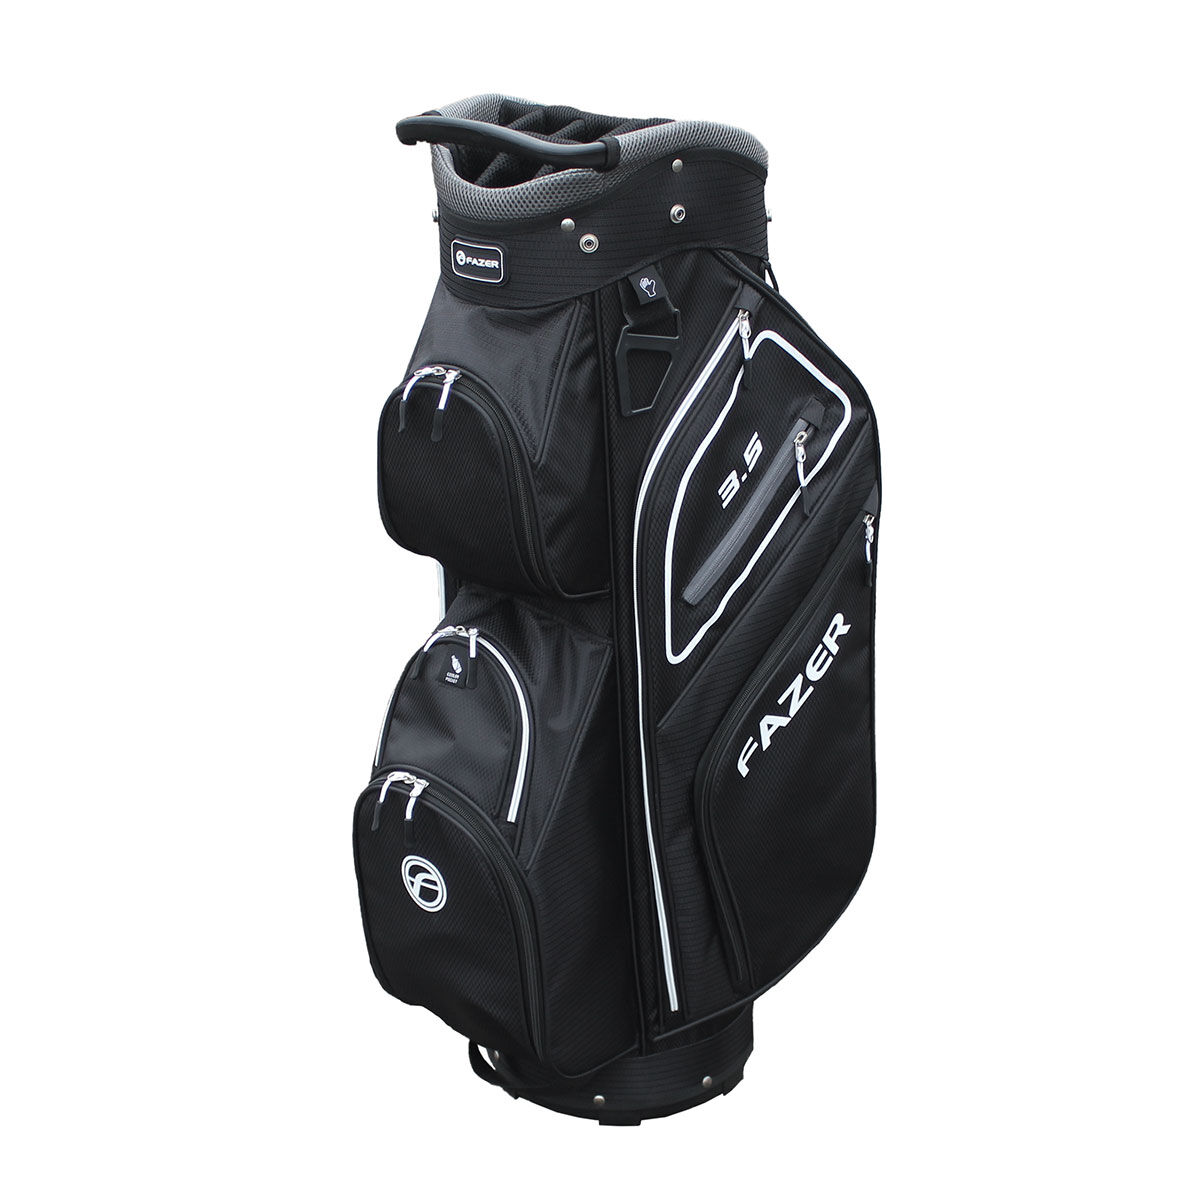 "Fazer 3.5 Golf Cart Bag, Black/silver, 9"" | American Golf"